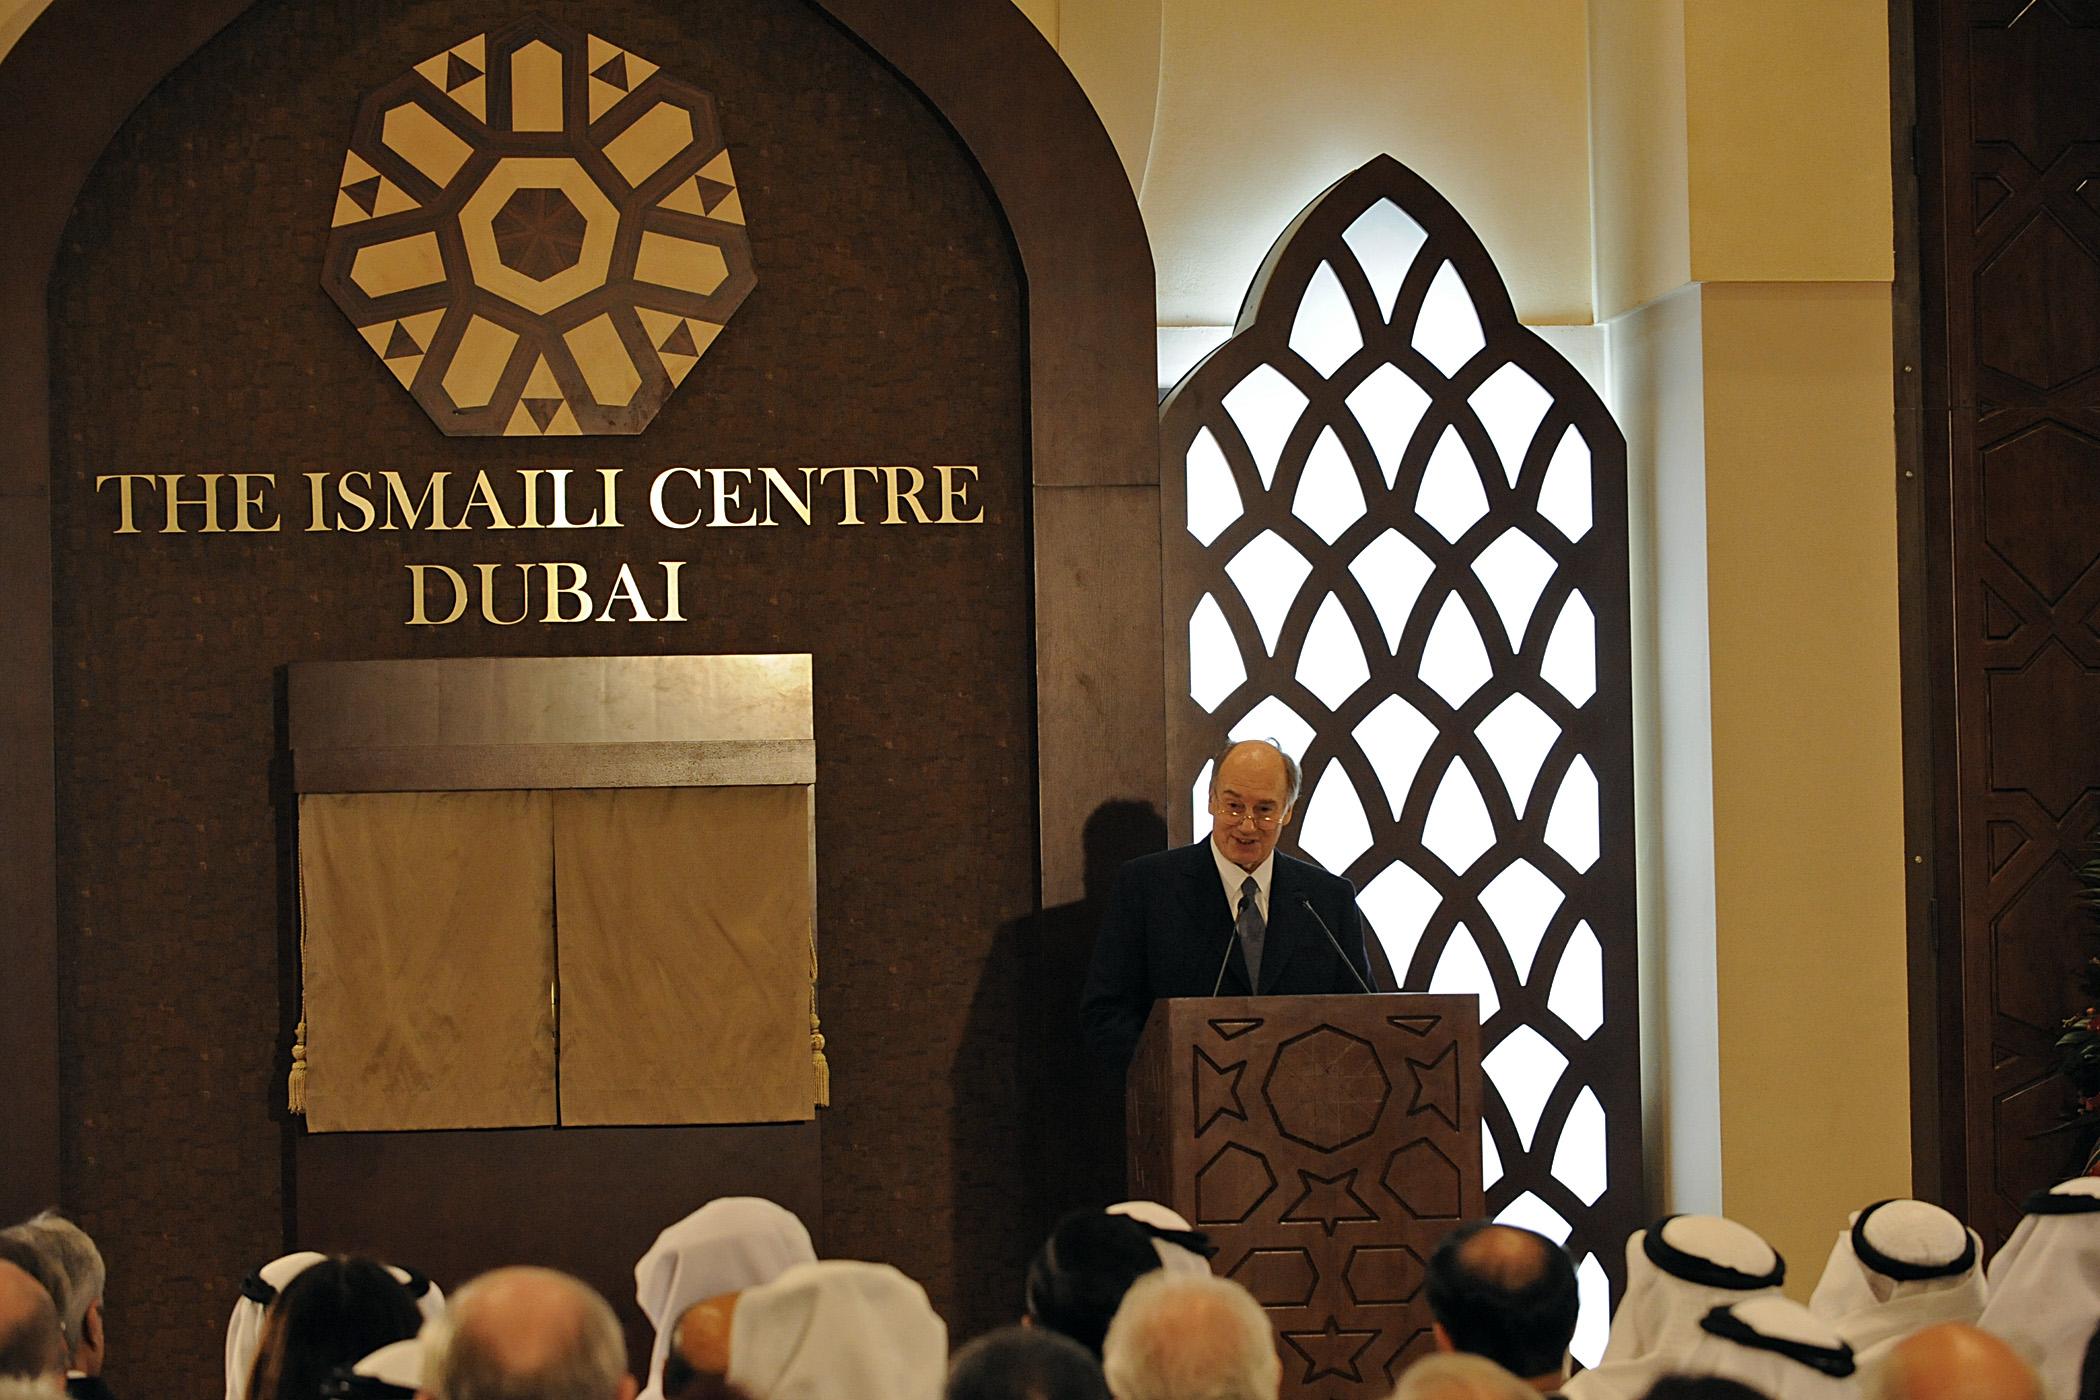 Ismaili Centre Dubai